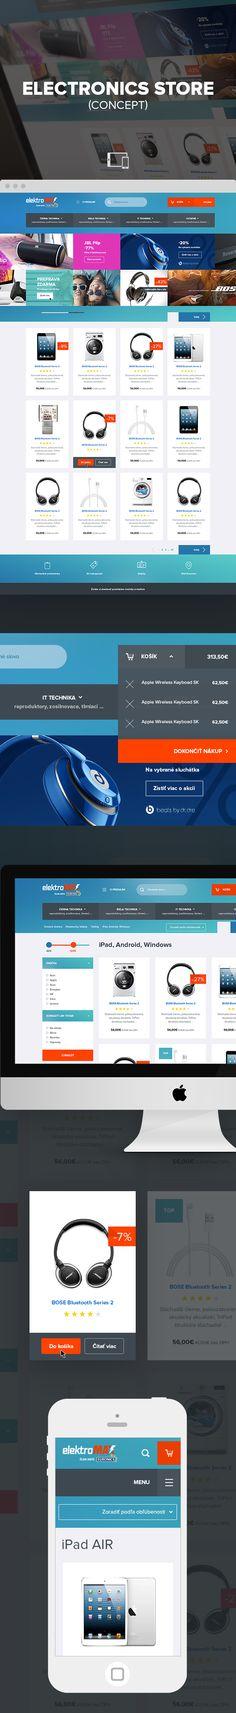 ecommerce concept on Behance